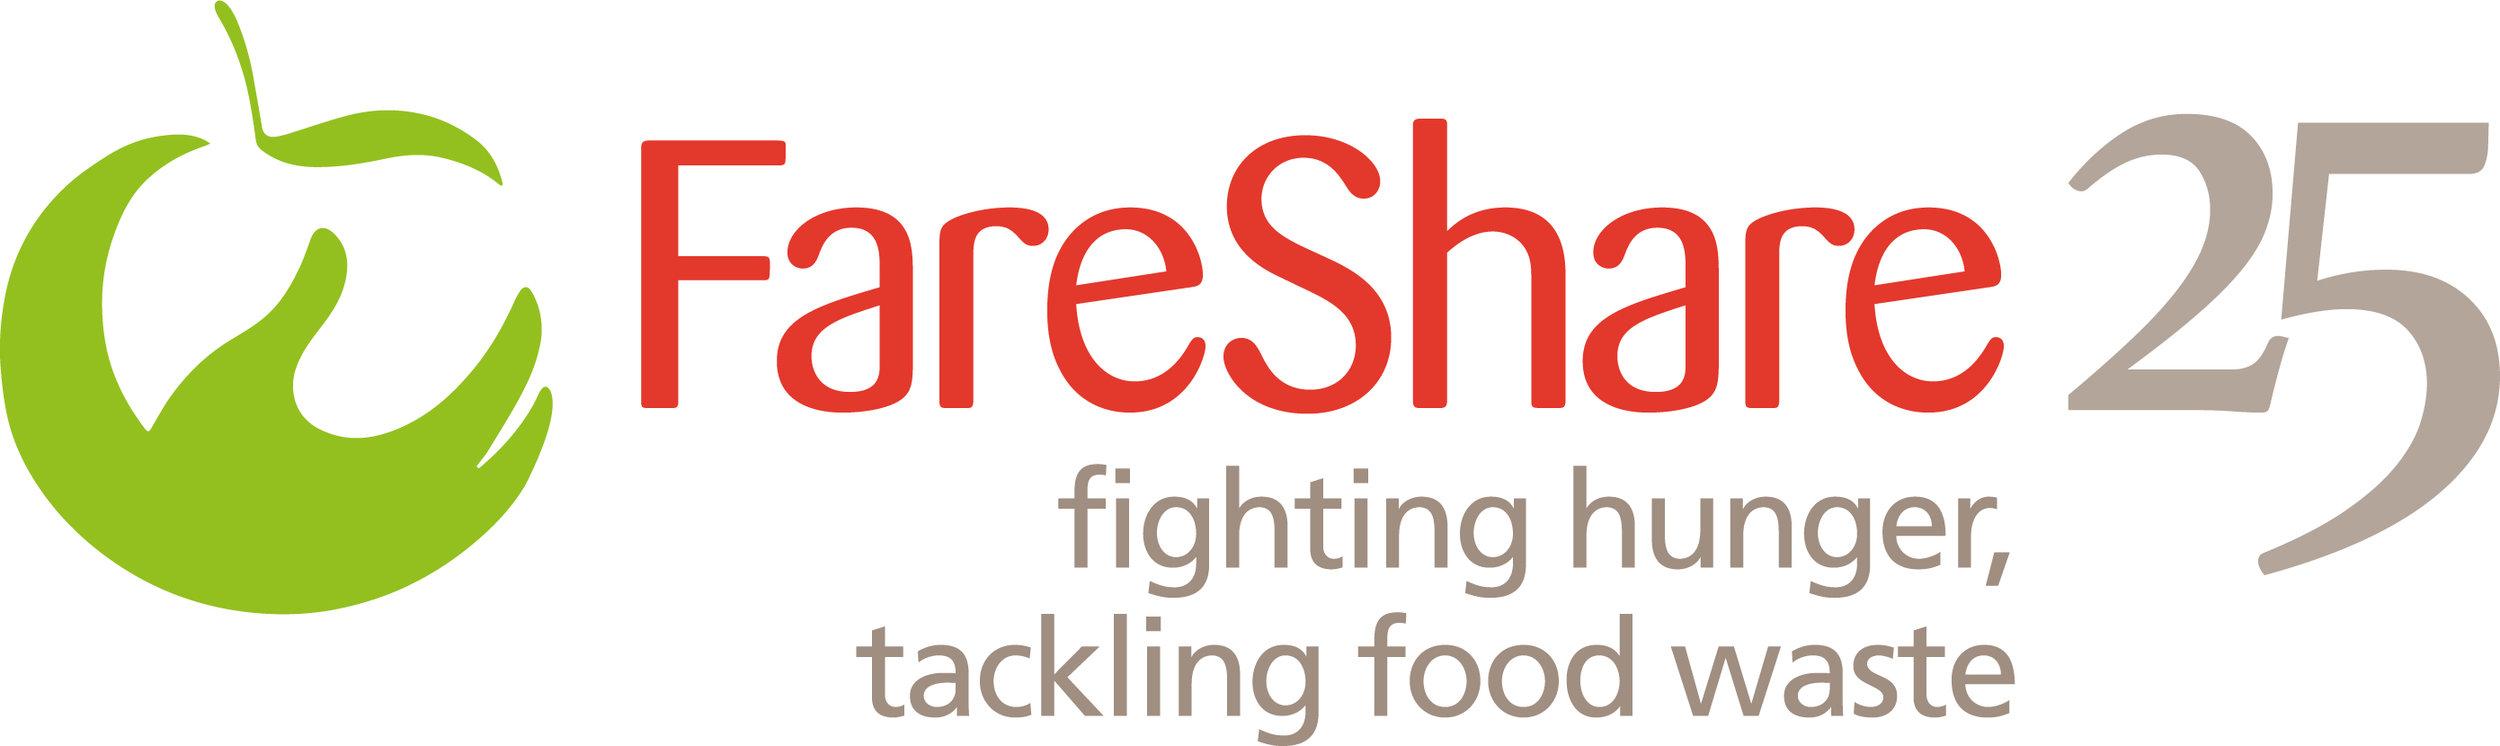 FareShare_25_Logo_RGB.jpg